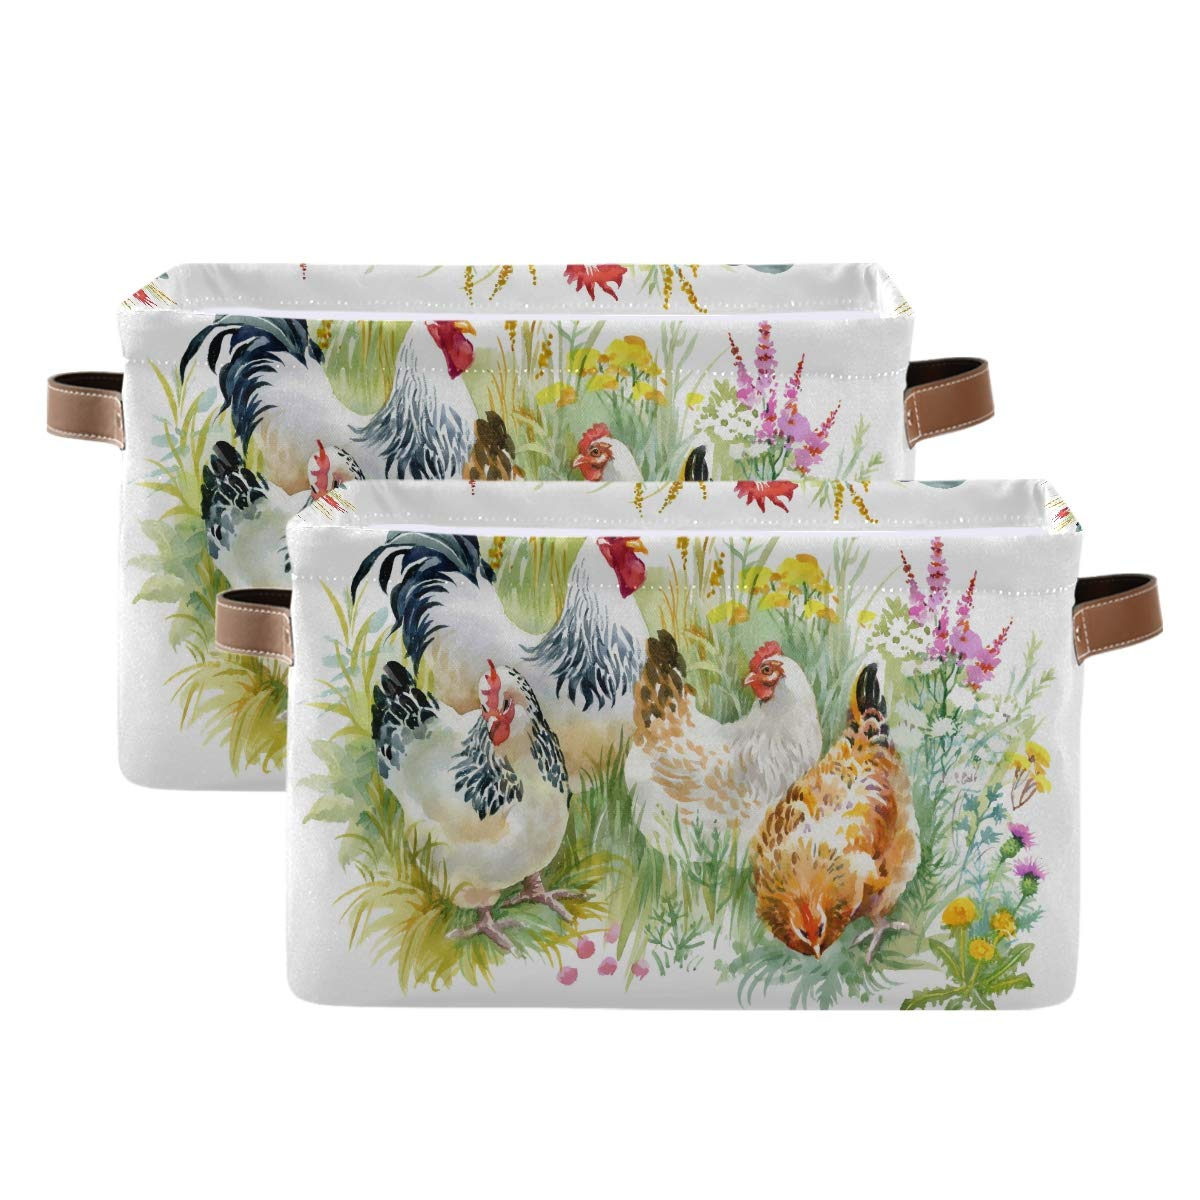 Department store WXLIFE Storage Basket Bins Farm 4 years warranty Lea Animal Rooster Flower Autumn